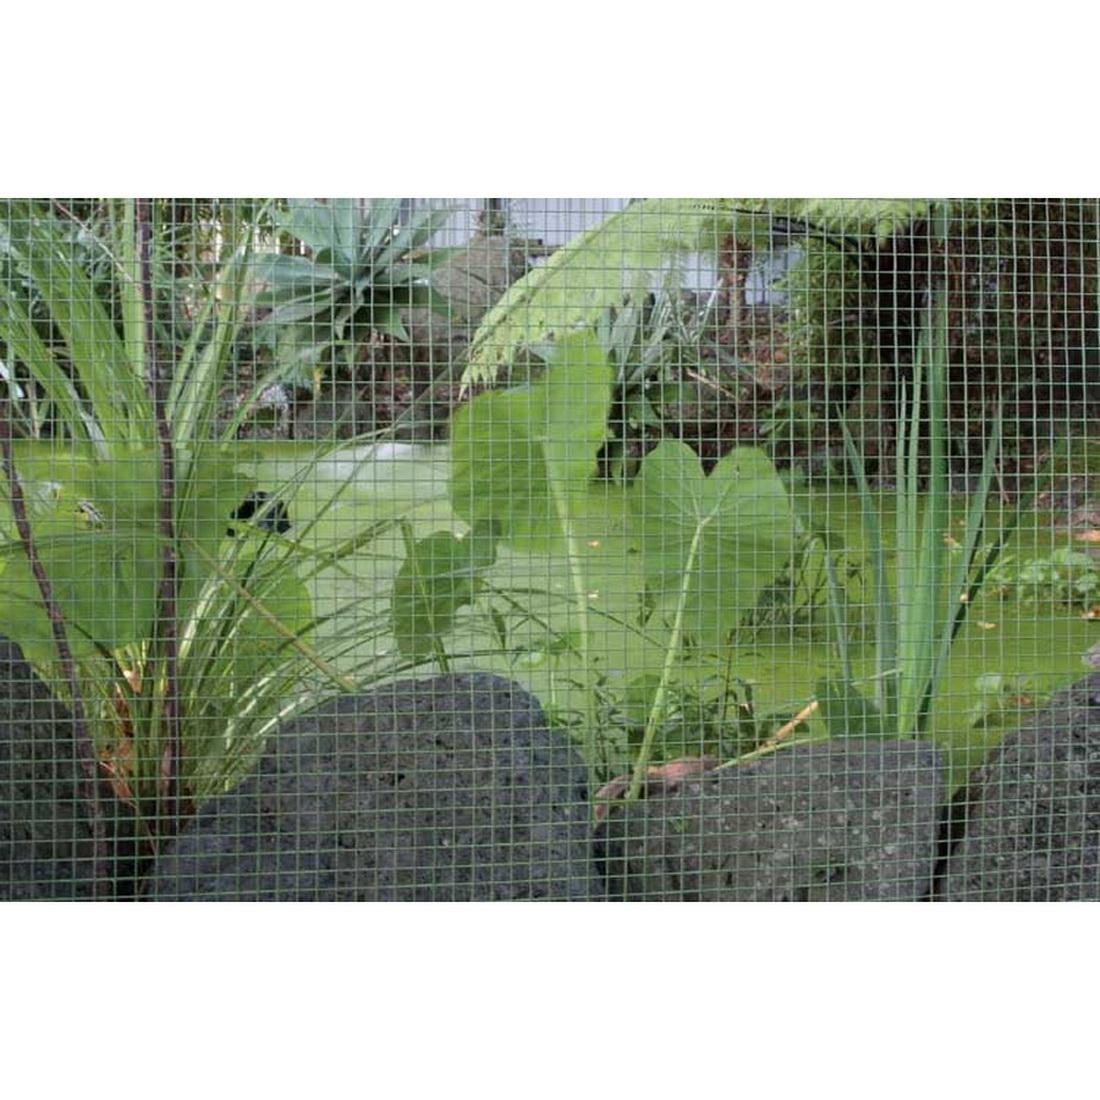 Cyclone Green PVC Square Welded Mesh 900 x 25 x 0.7mm 5m 8571091